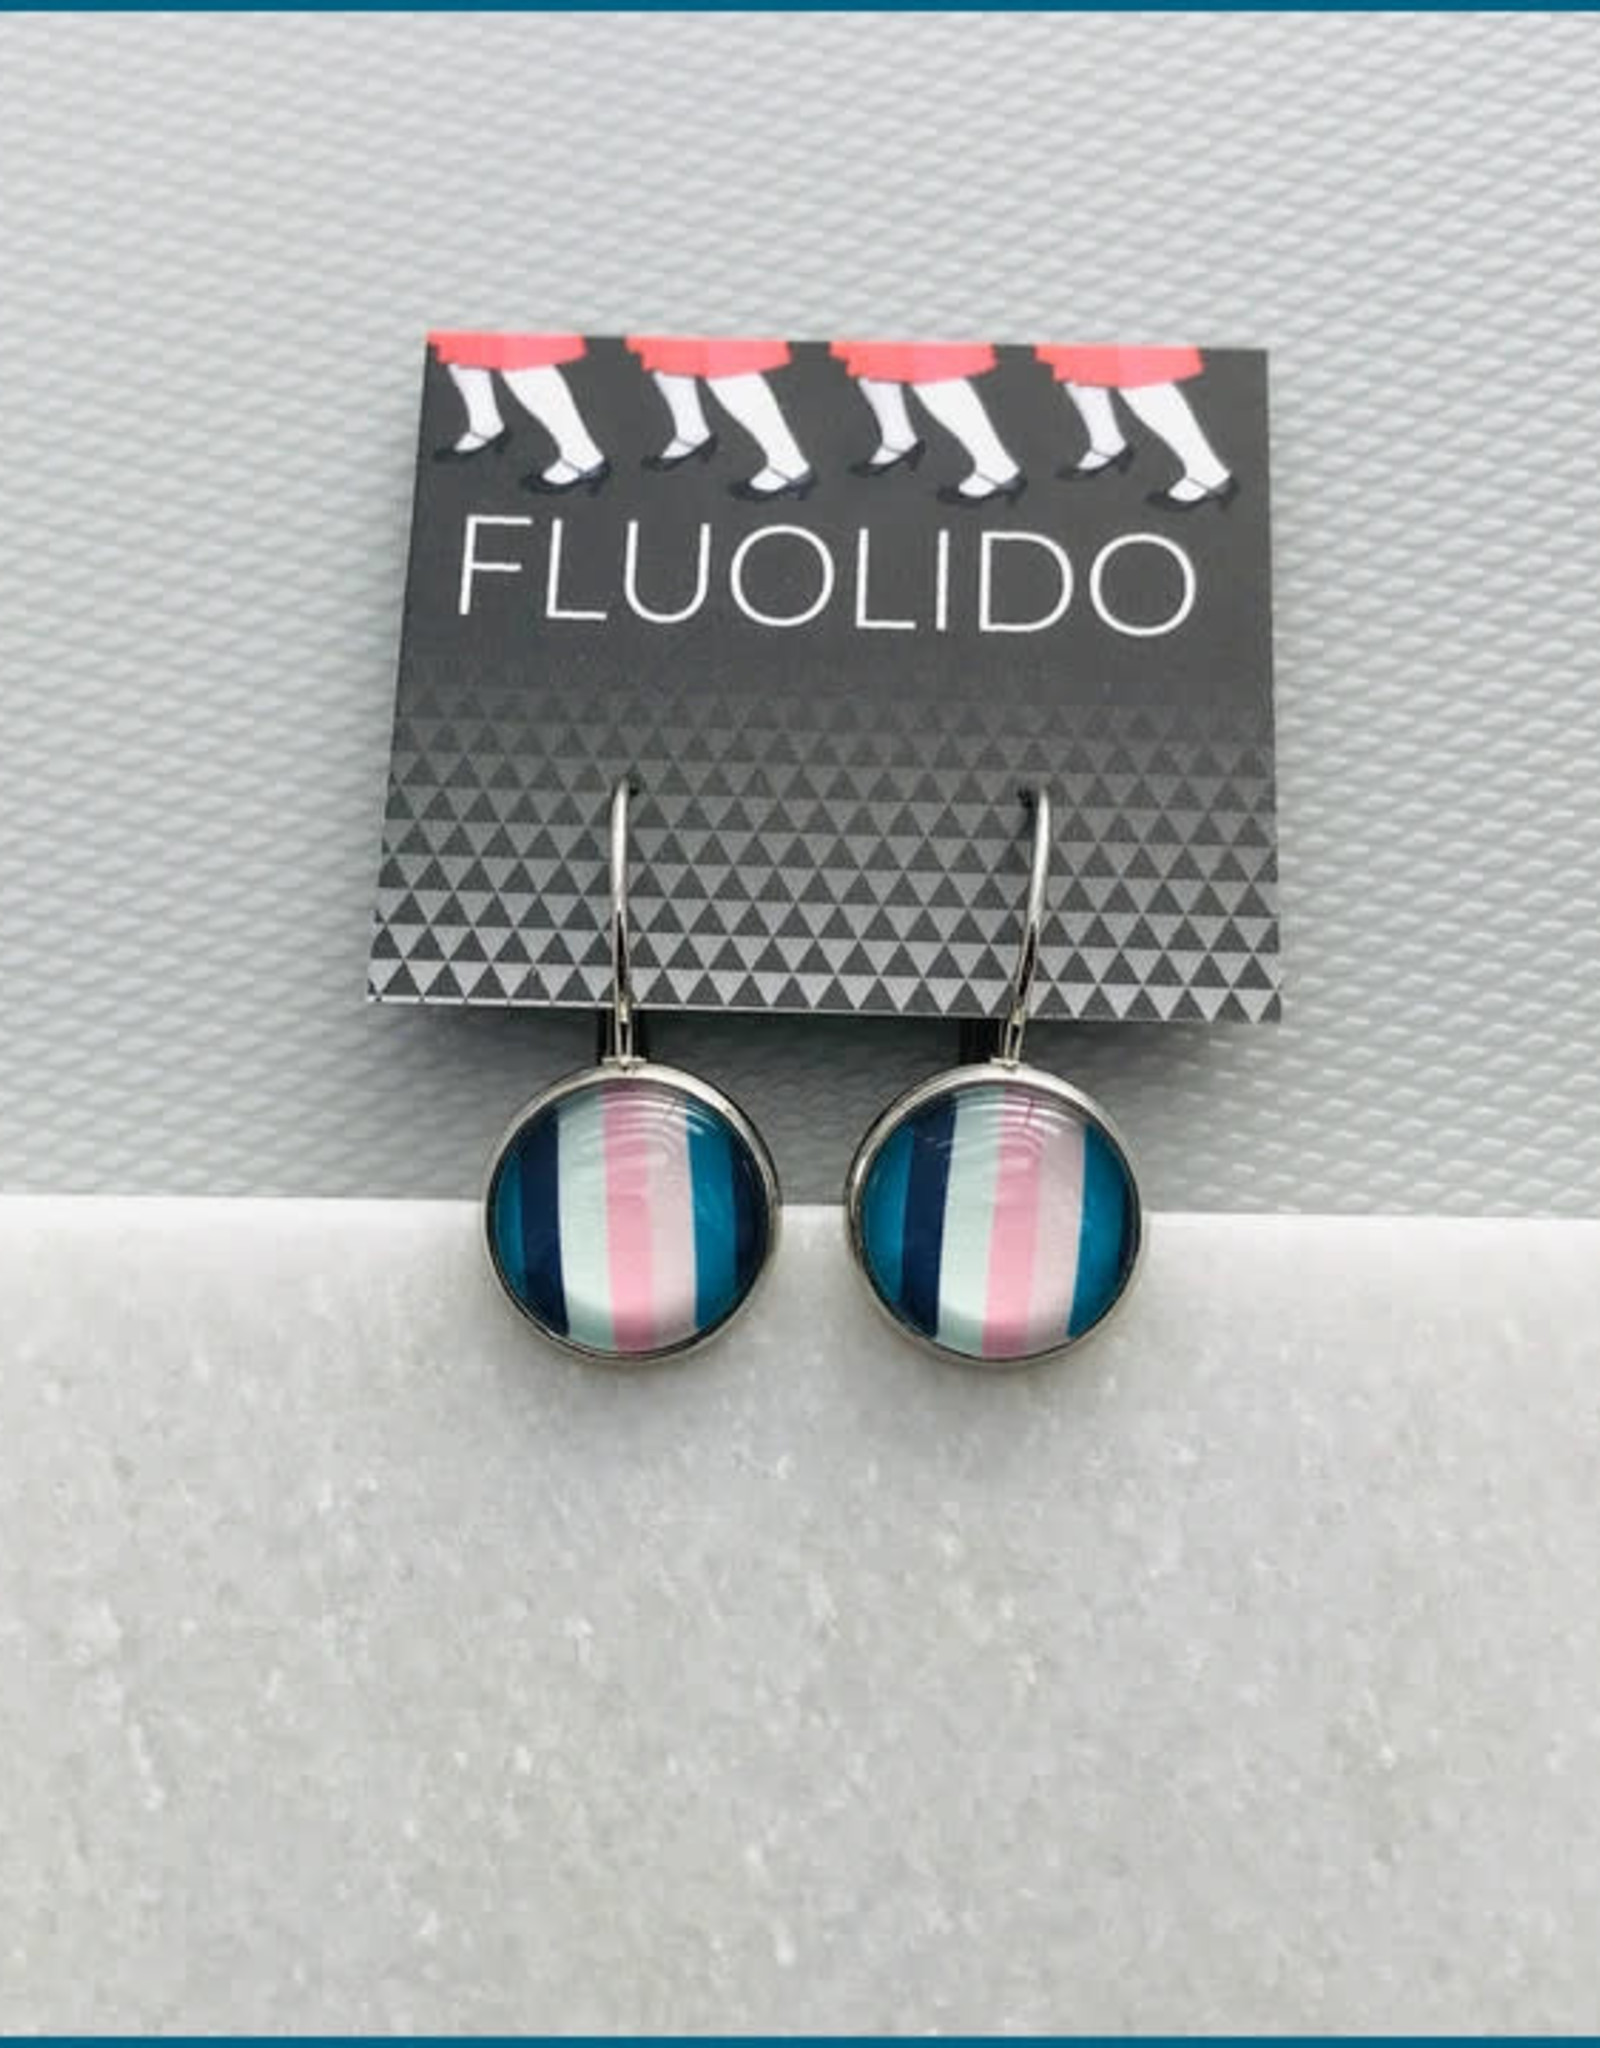 Fluolido Boucles d'oreilles Micro Fluolido Sweet